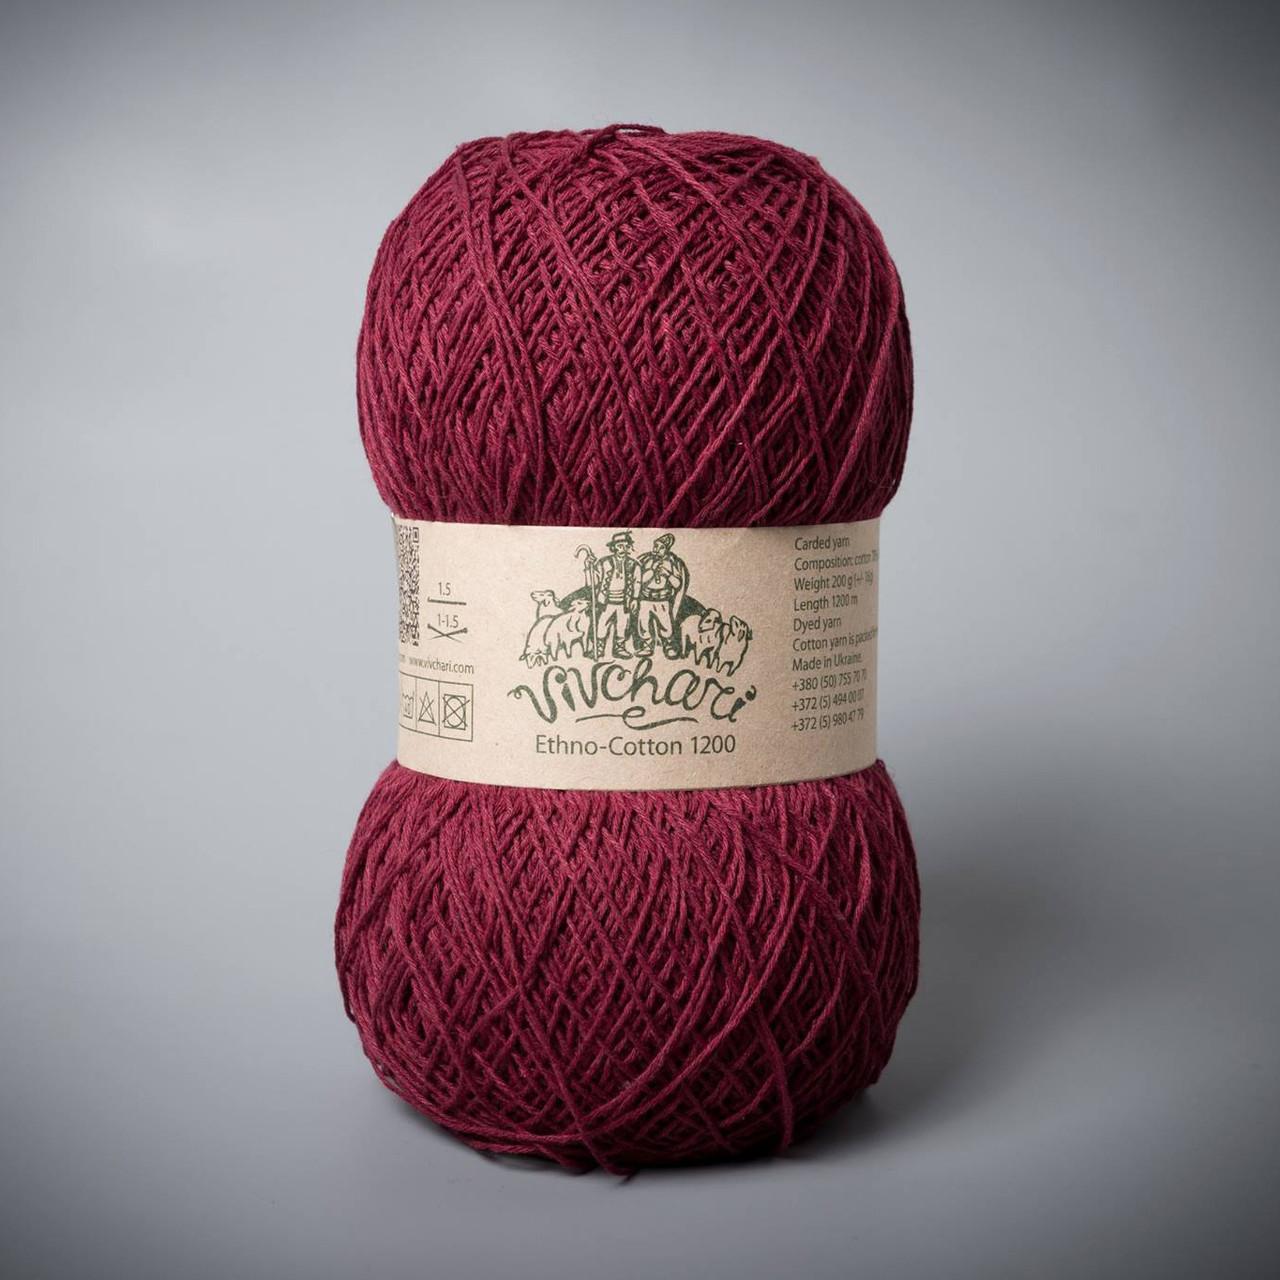 Пряжа хлопок и лен Vivchari Ethno-Cotton 1200, цвет 018 бордо